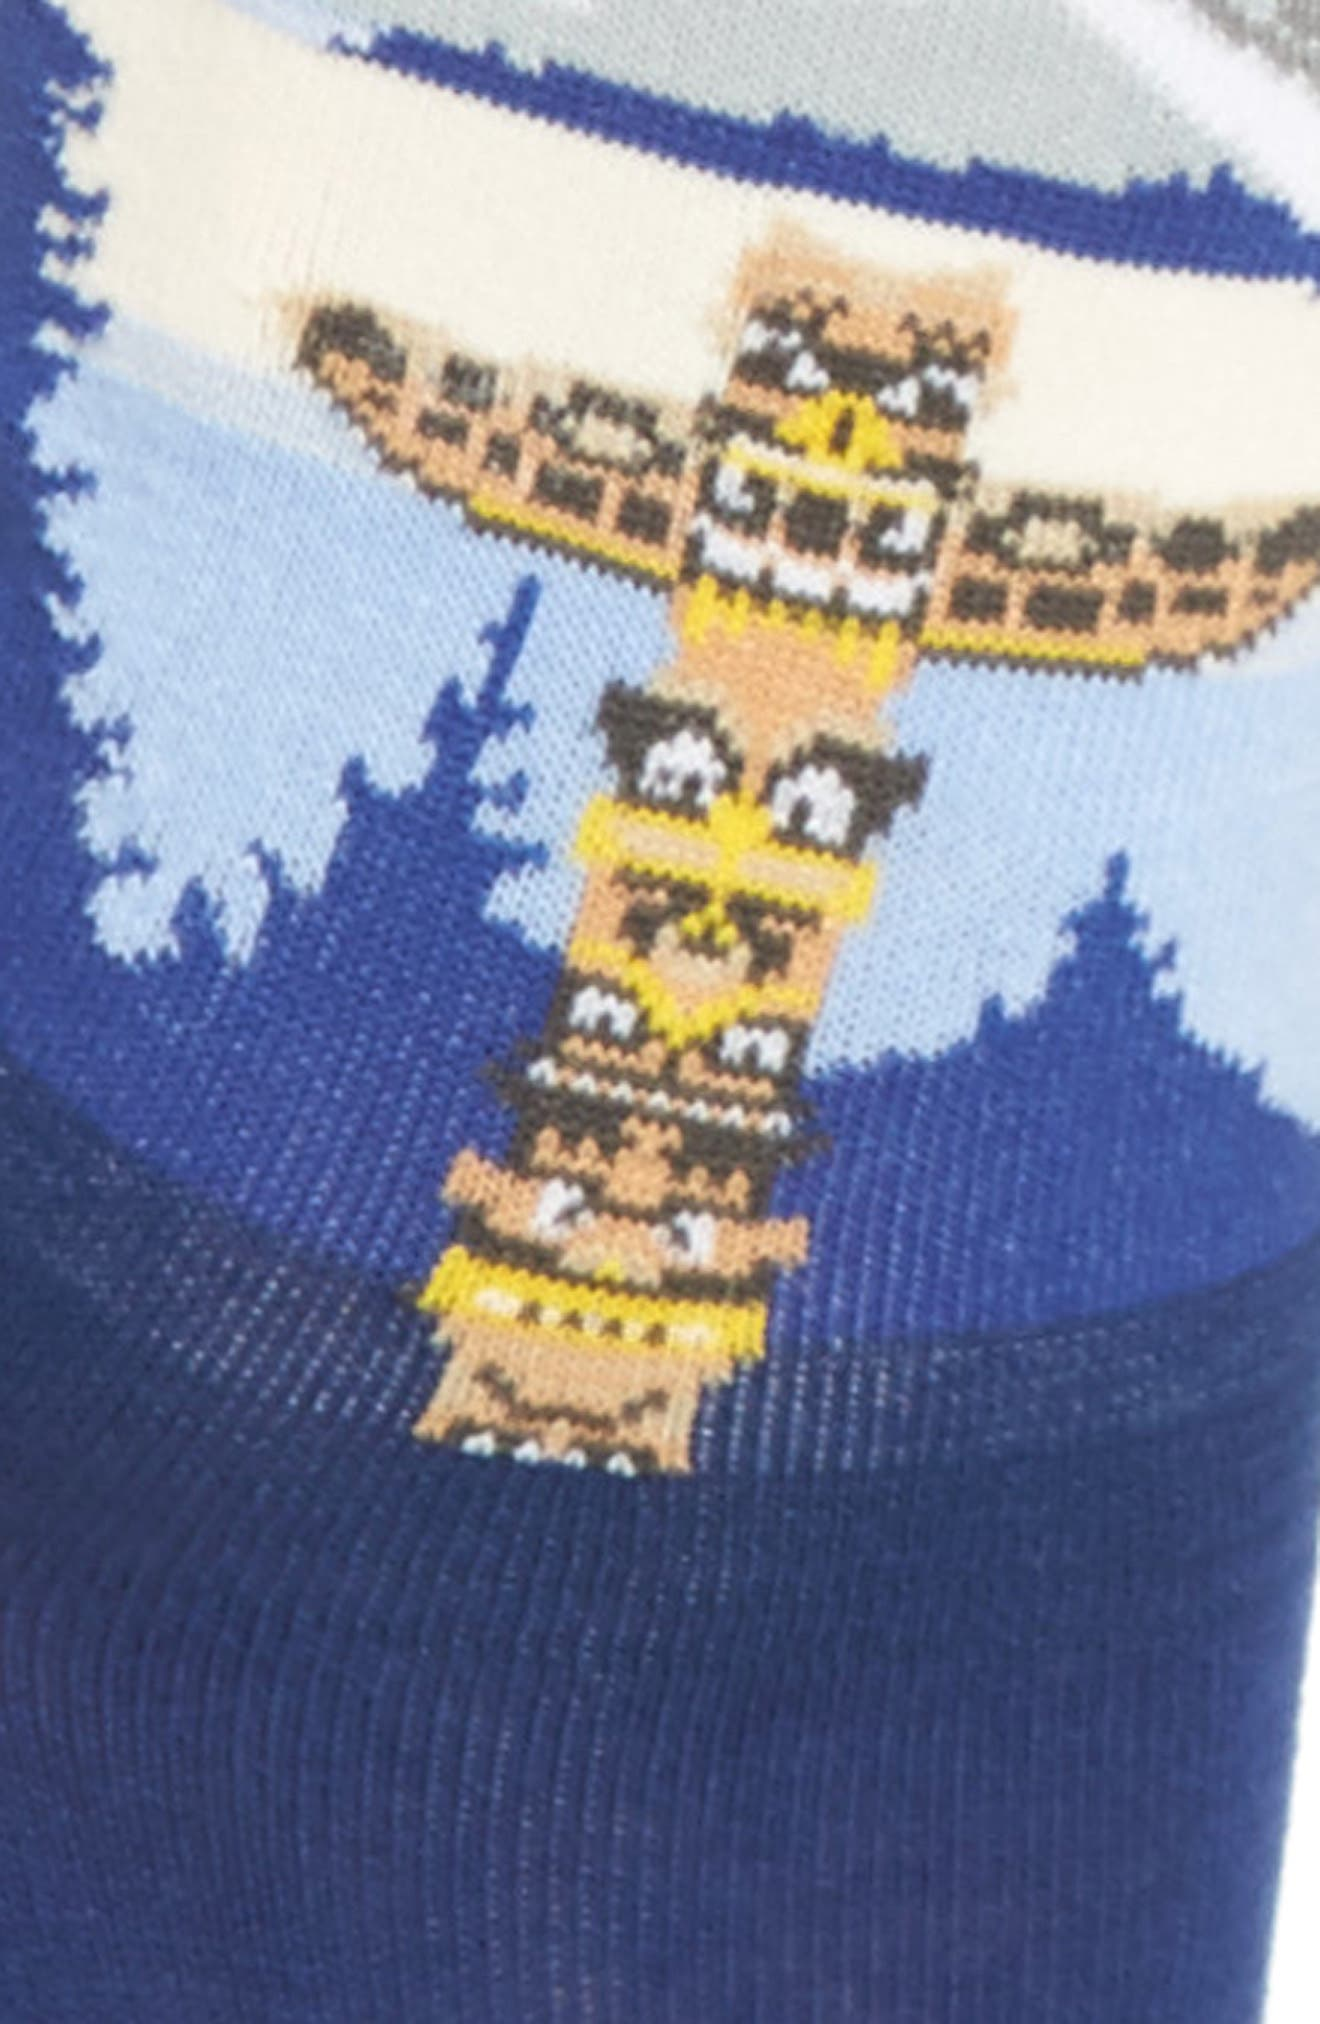 Travel Series - Alaska Crew Socks,                             Alternate thumbnail 3, color,                             439